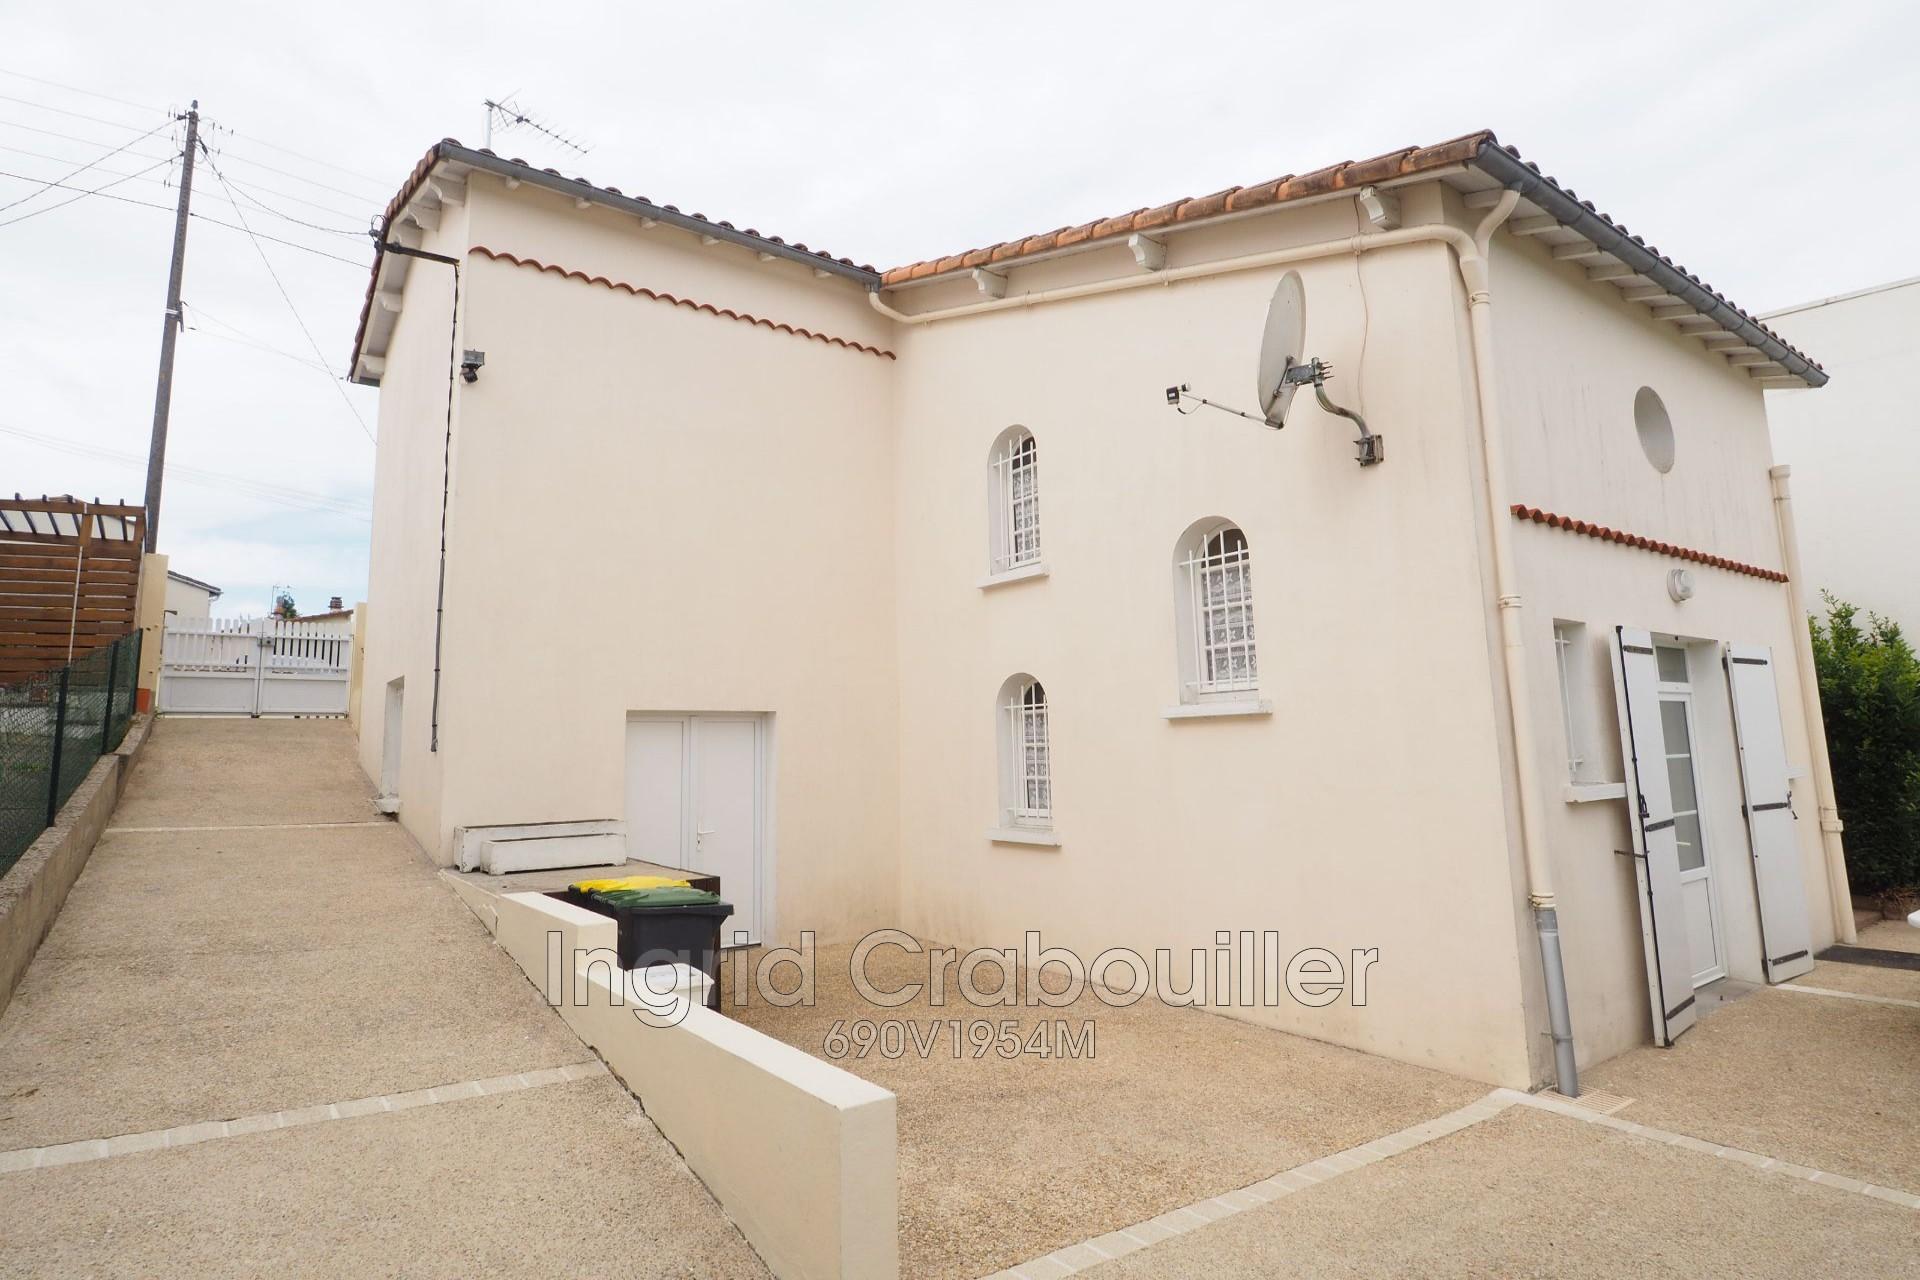 Vente maison Royan - réf. 690V1954M